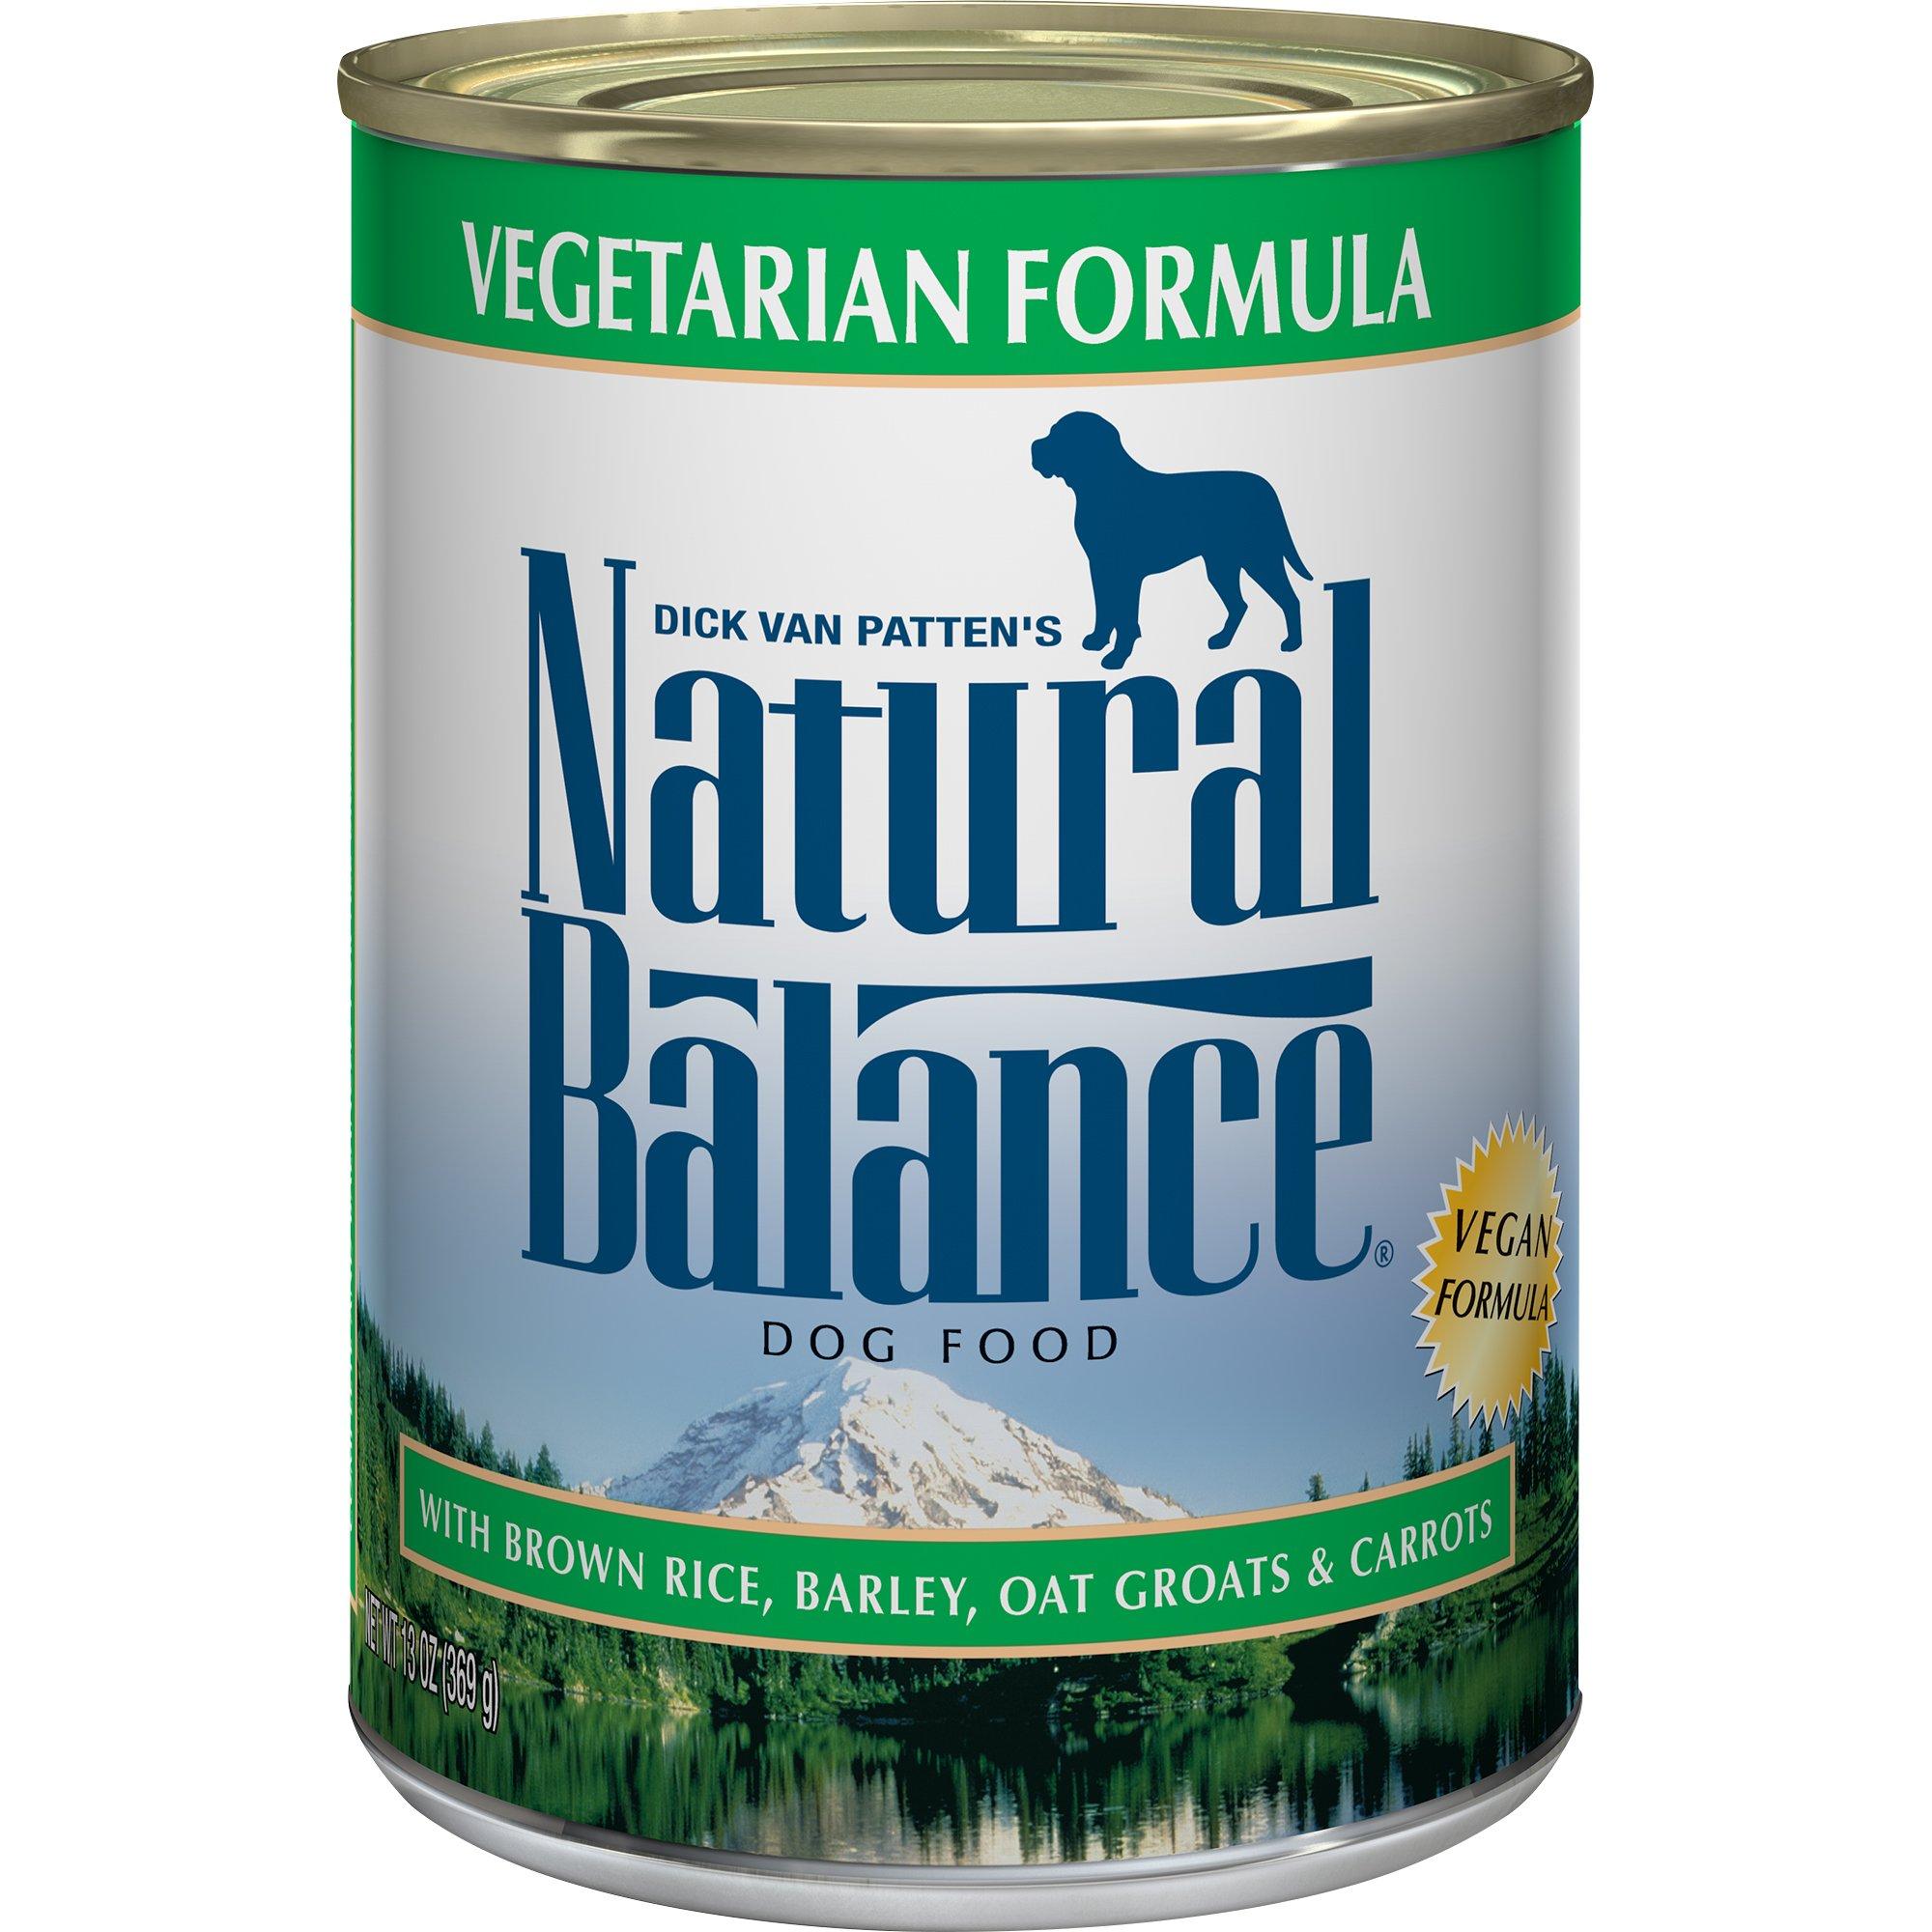 Natural Balance Vegetarian Formula with Brown Rice, Barley, Oat Groats & Carrots Wet Dog Food, 13 Ounces (Pack of 12), Vegan by Natural Balance